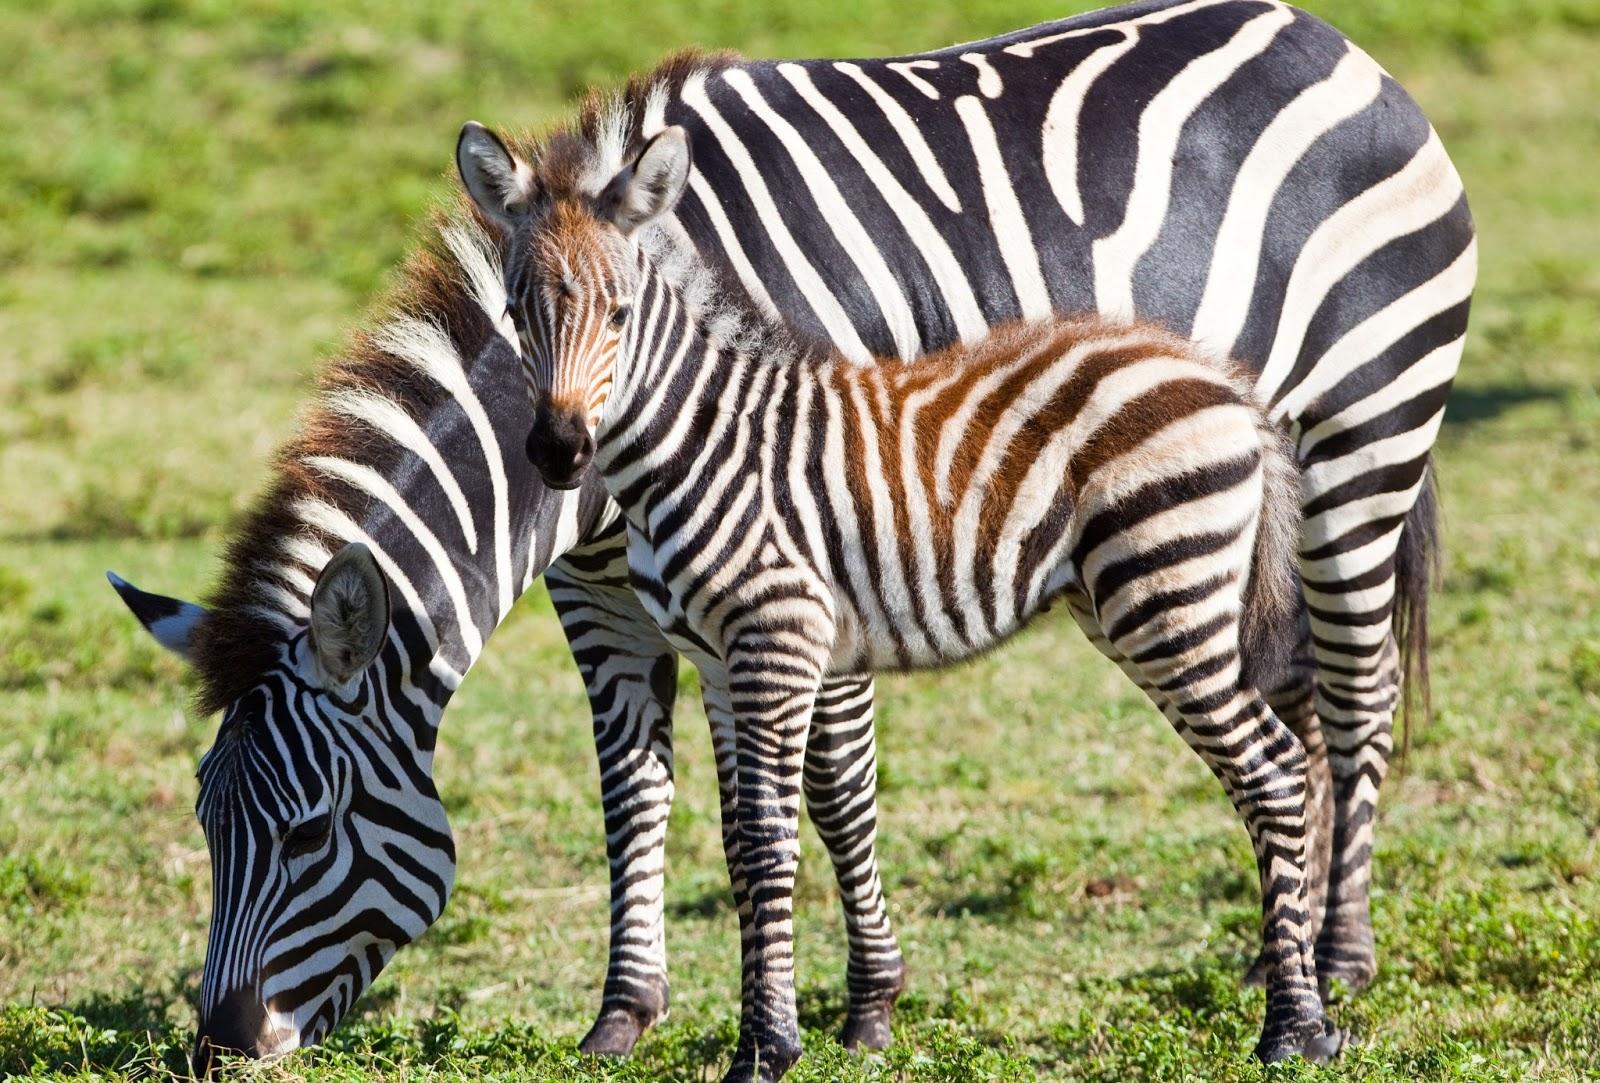 Http Wildlifeanimalz Blogspot Com 2013 04 Grevys Zebra Facts Html